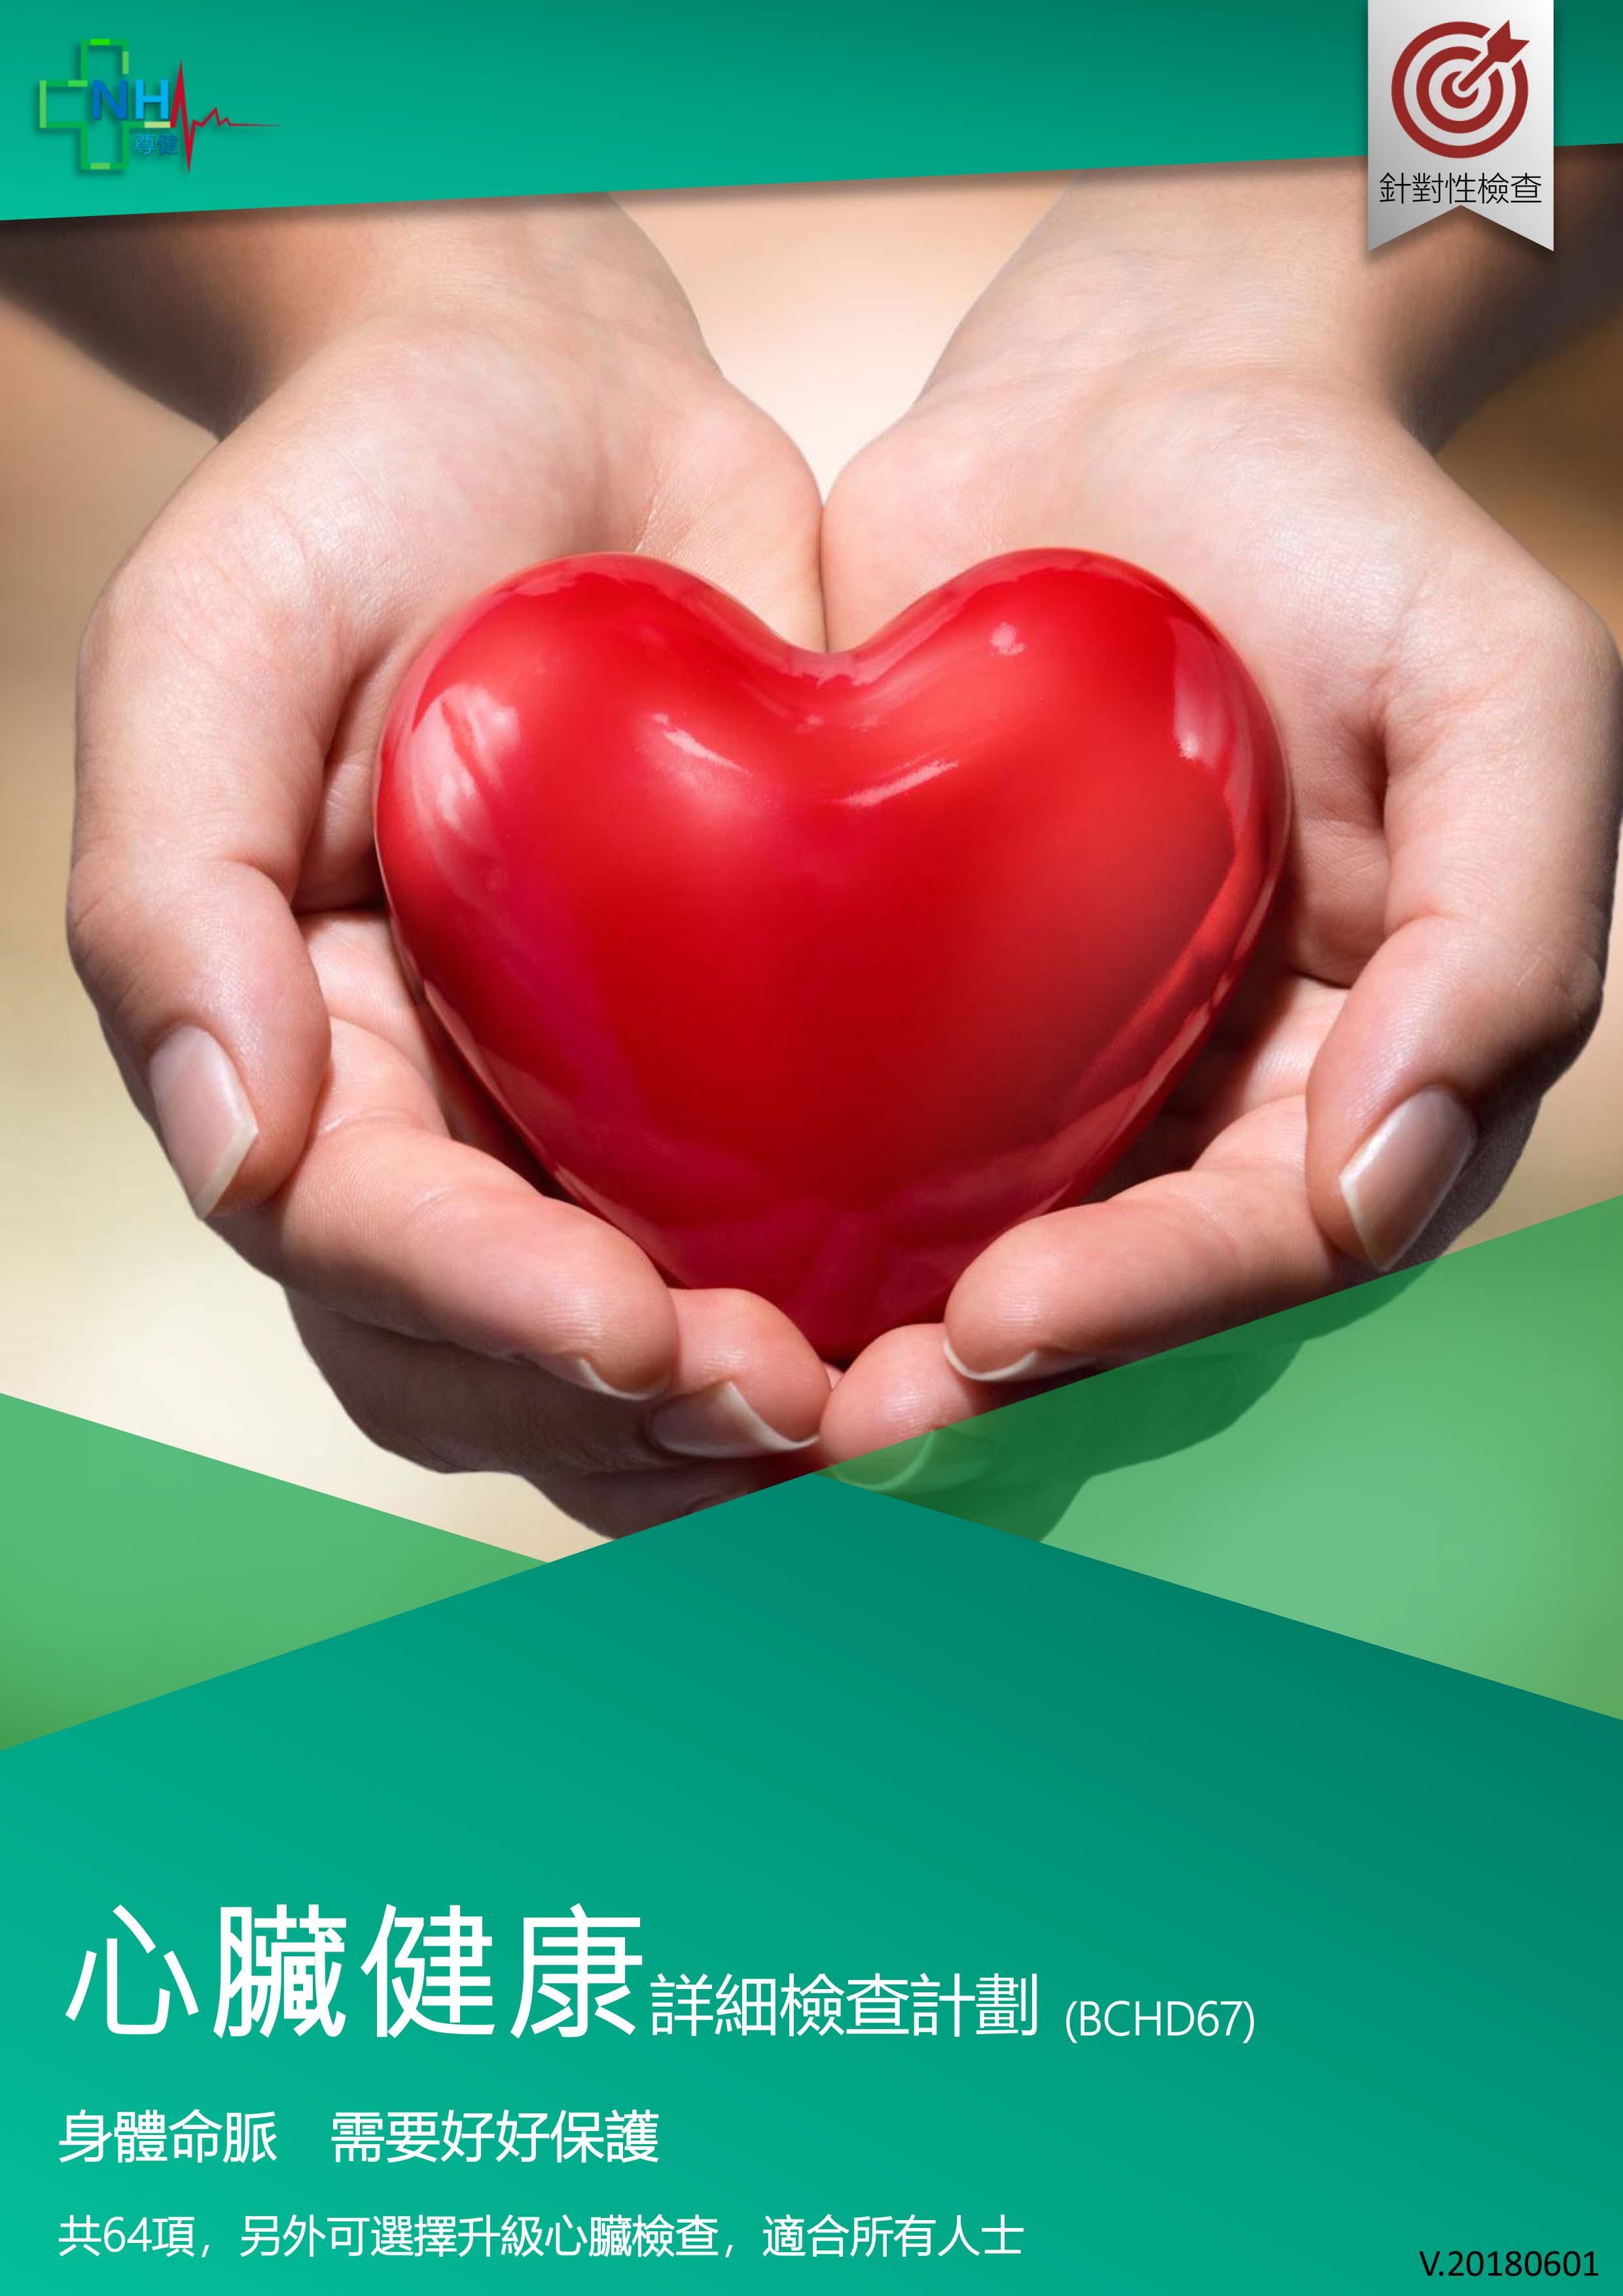 2e-heart-blood-health-check-1.jpg